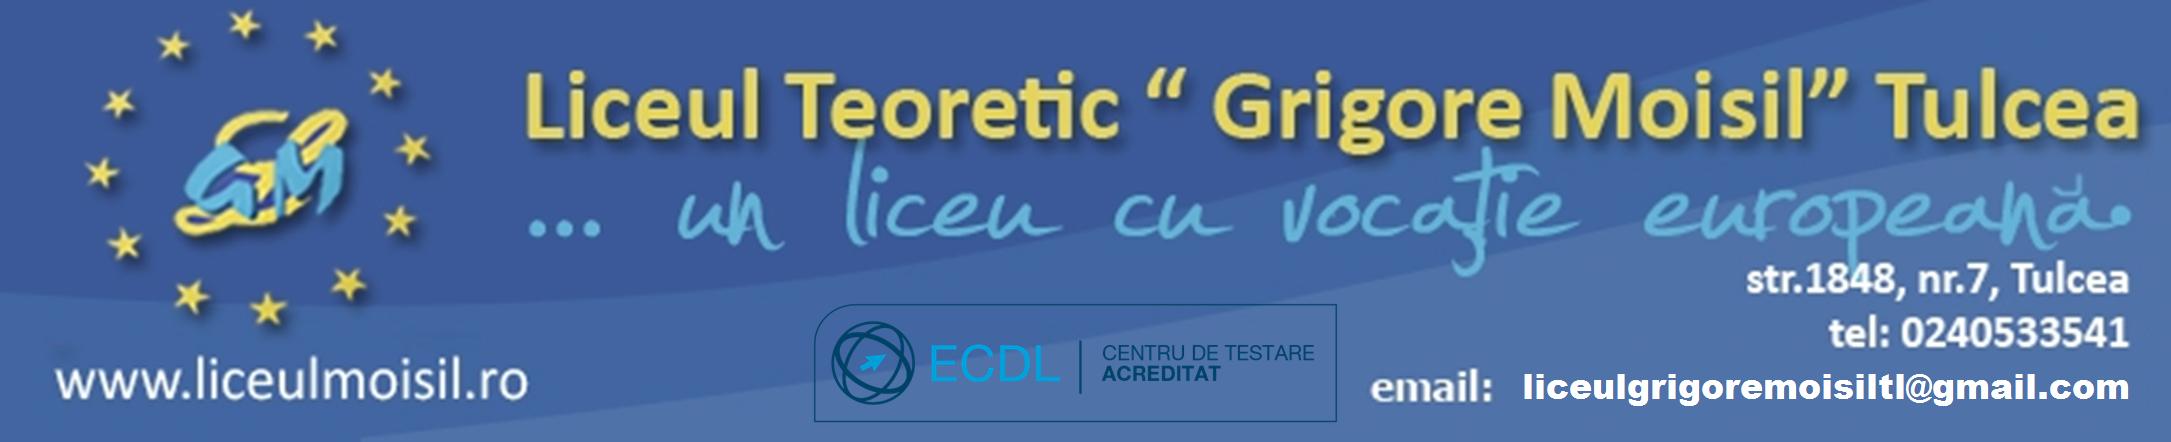 Web design Liceul Teoretic Grigore Moisil